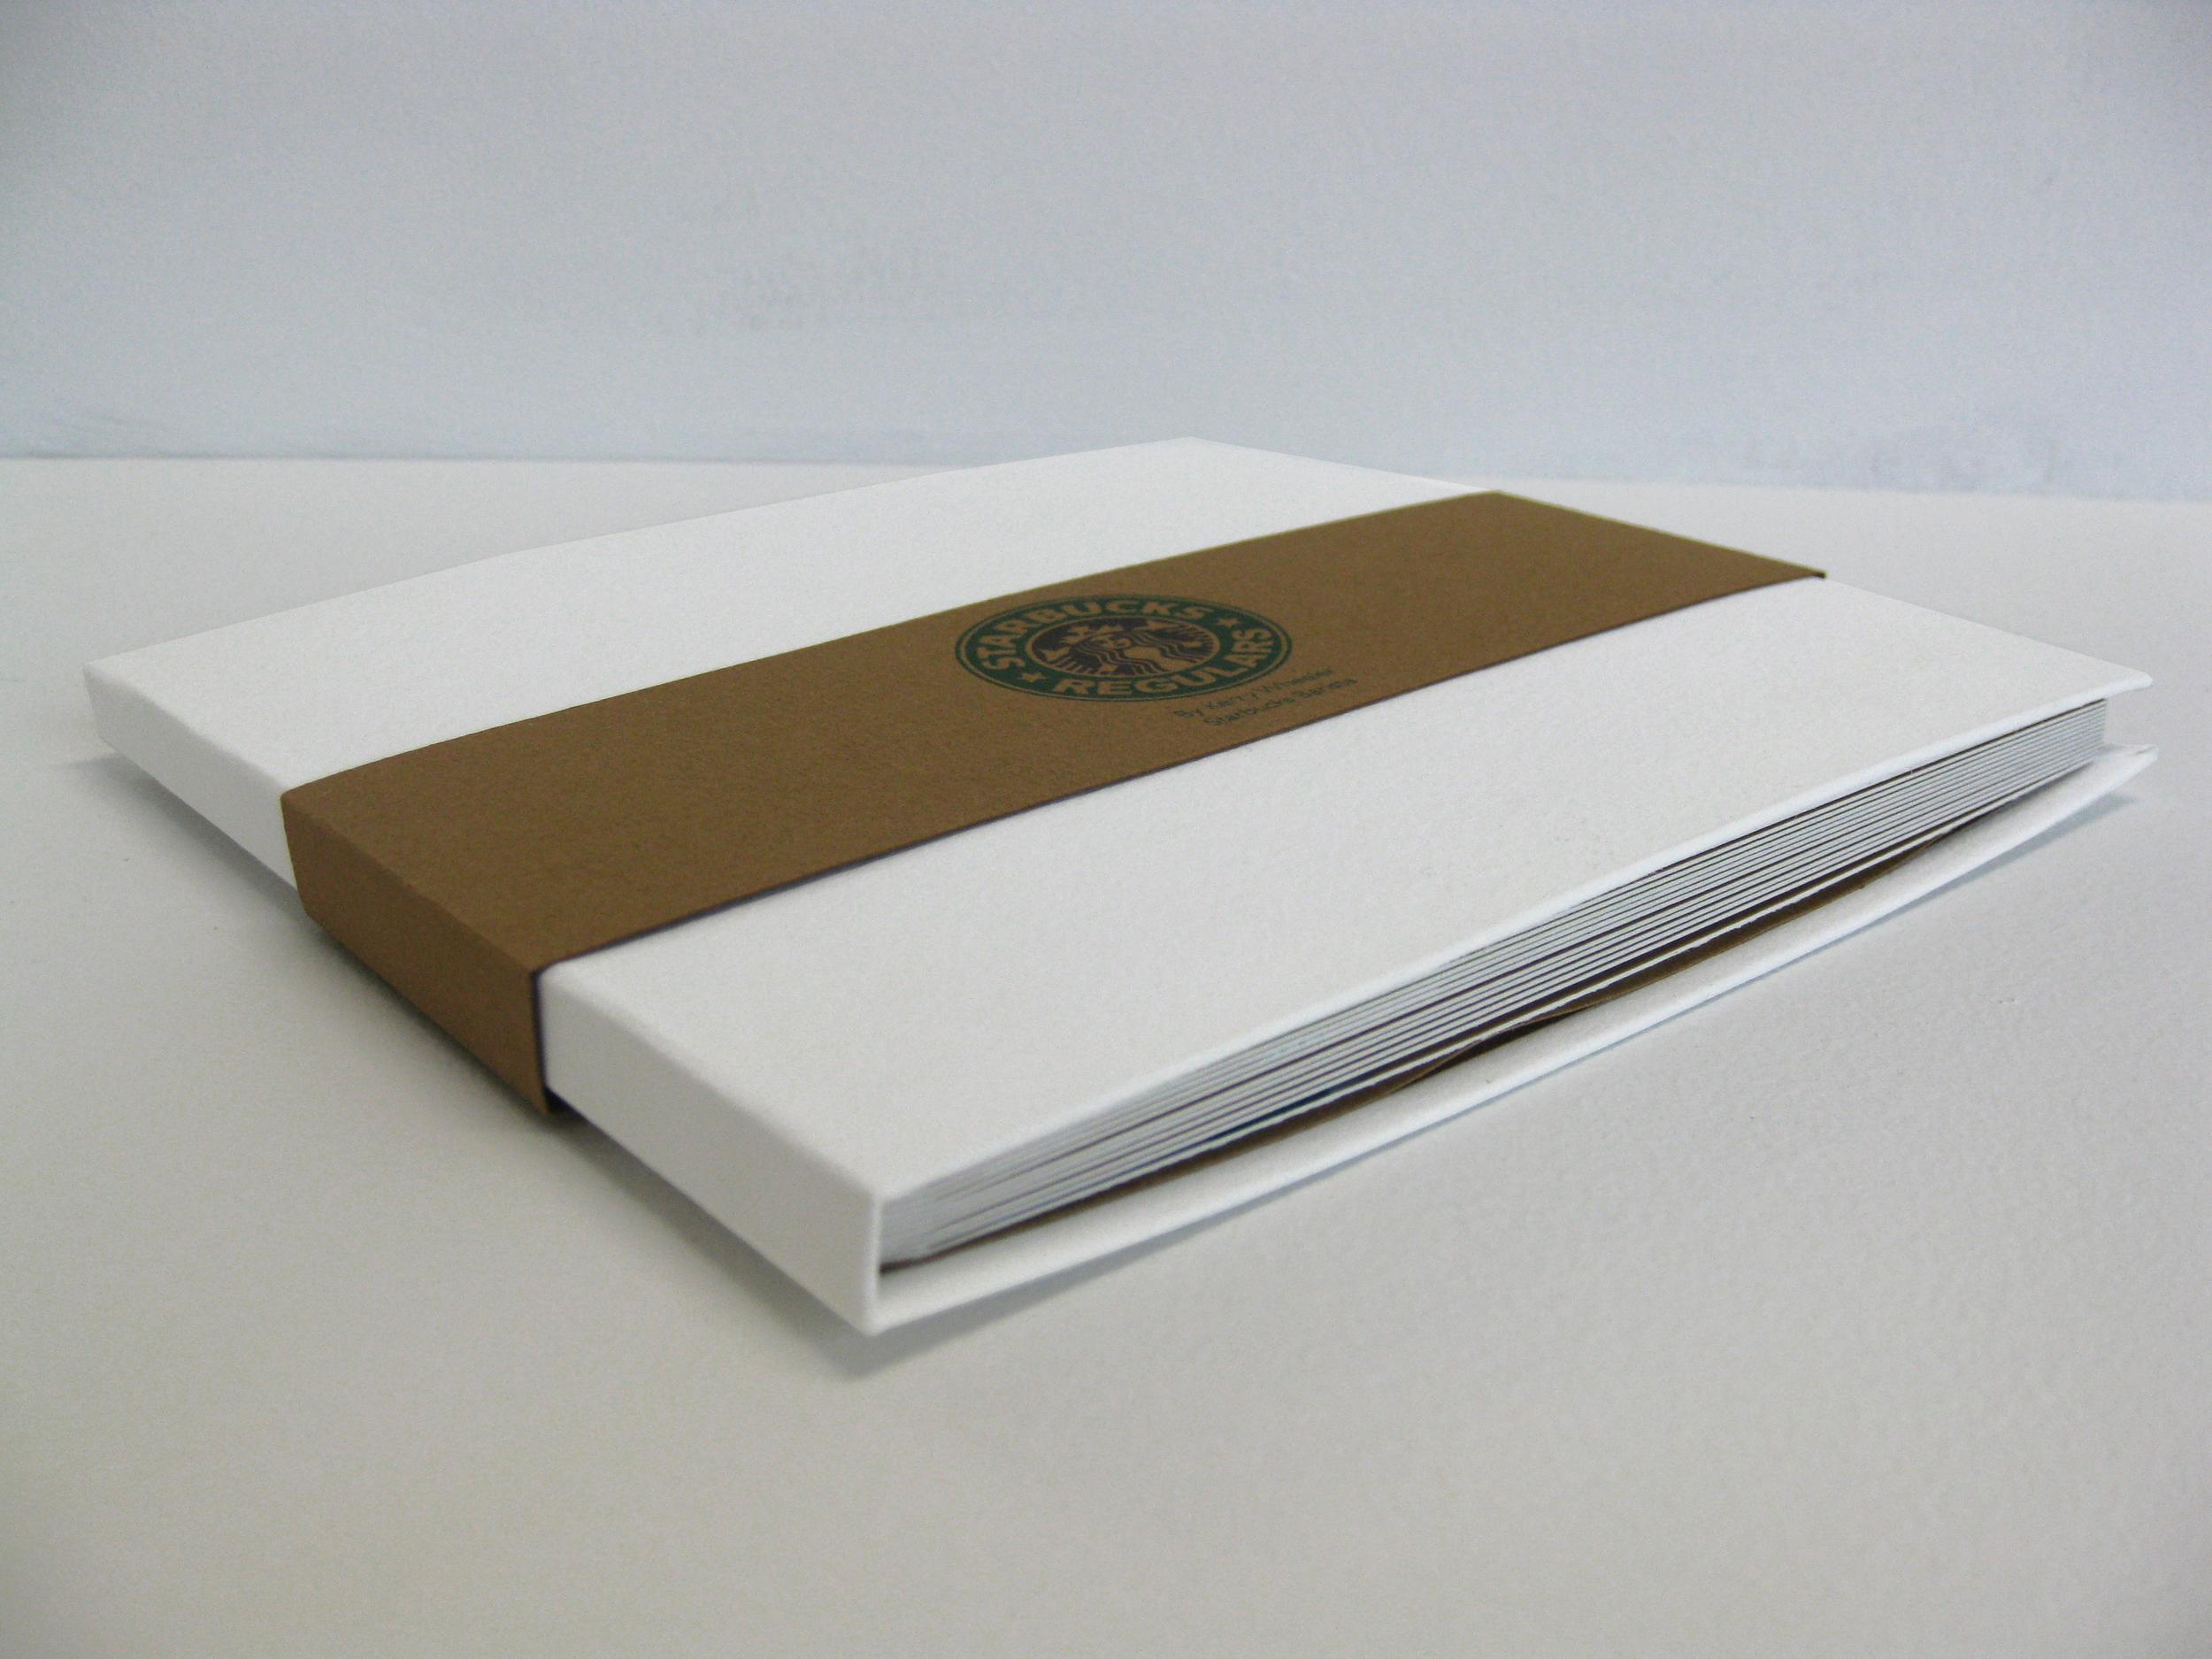 book on side.1.jpg